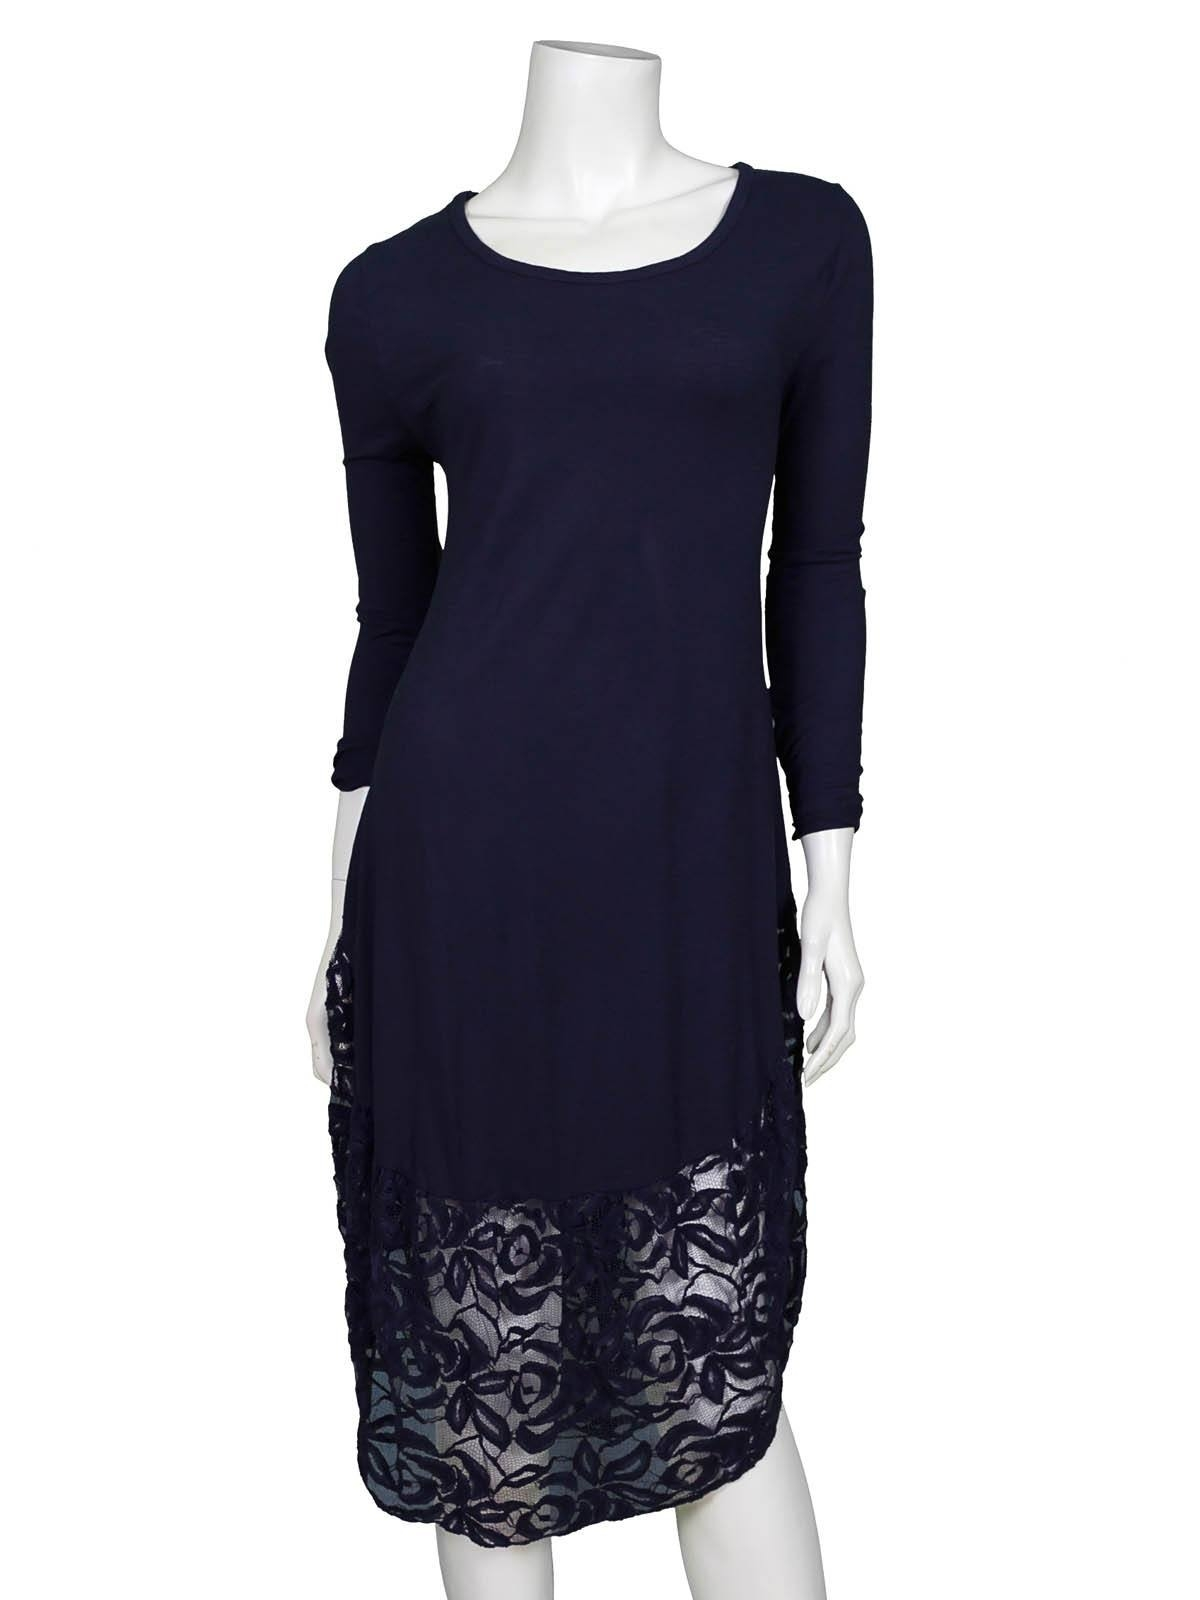 Designer Wunderbar Kleid Dunkelblau Spitze Bester PreisAbend Großartig Kleid Dunkelblau Spitze Design